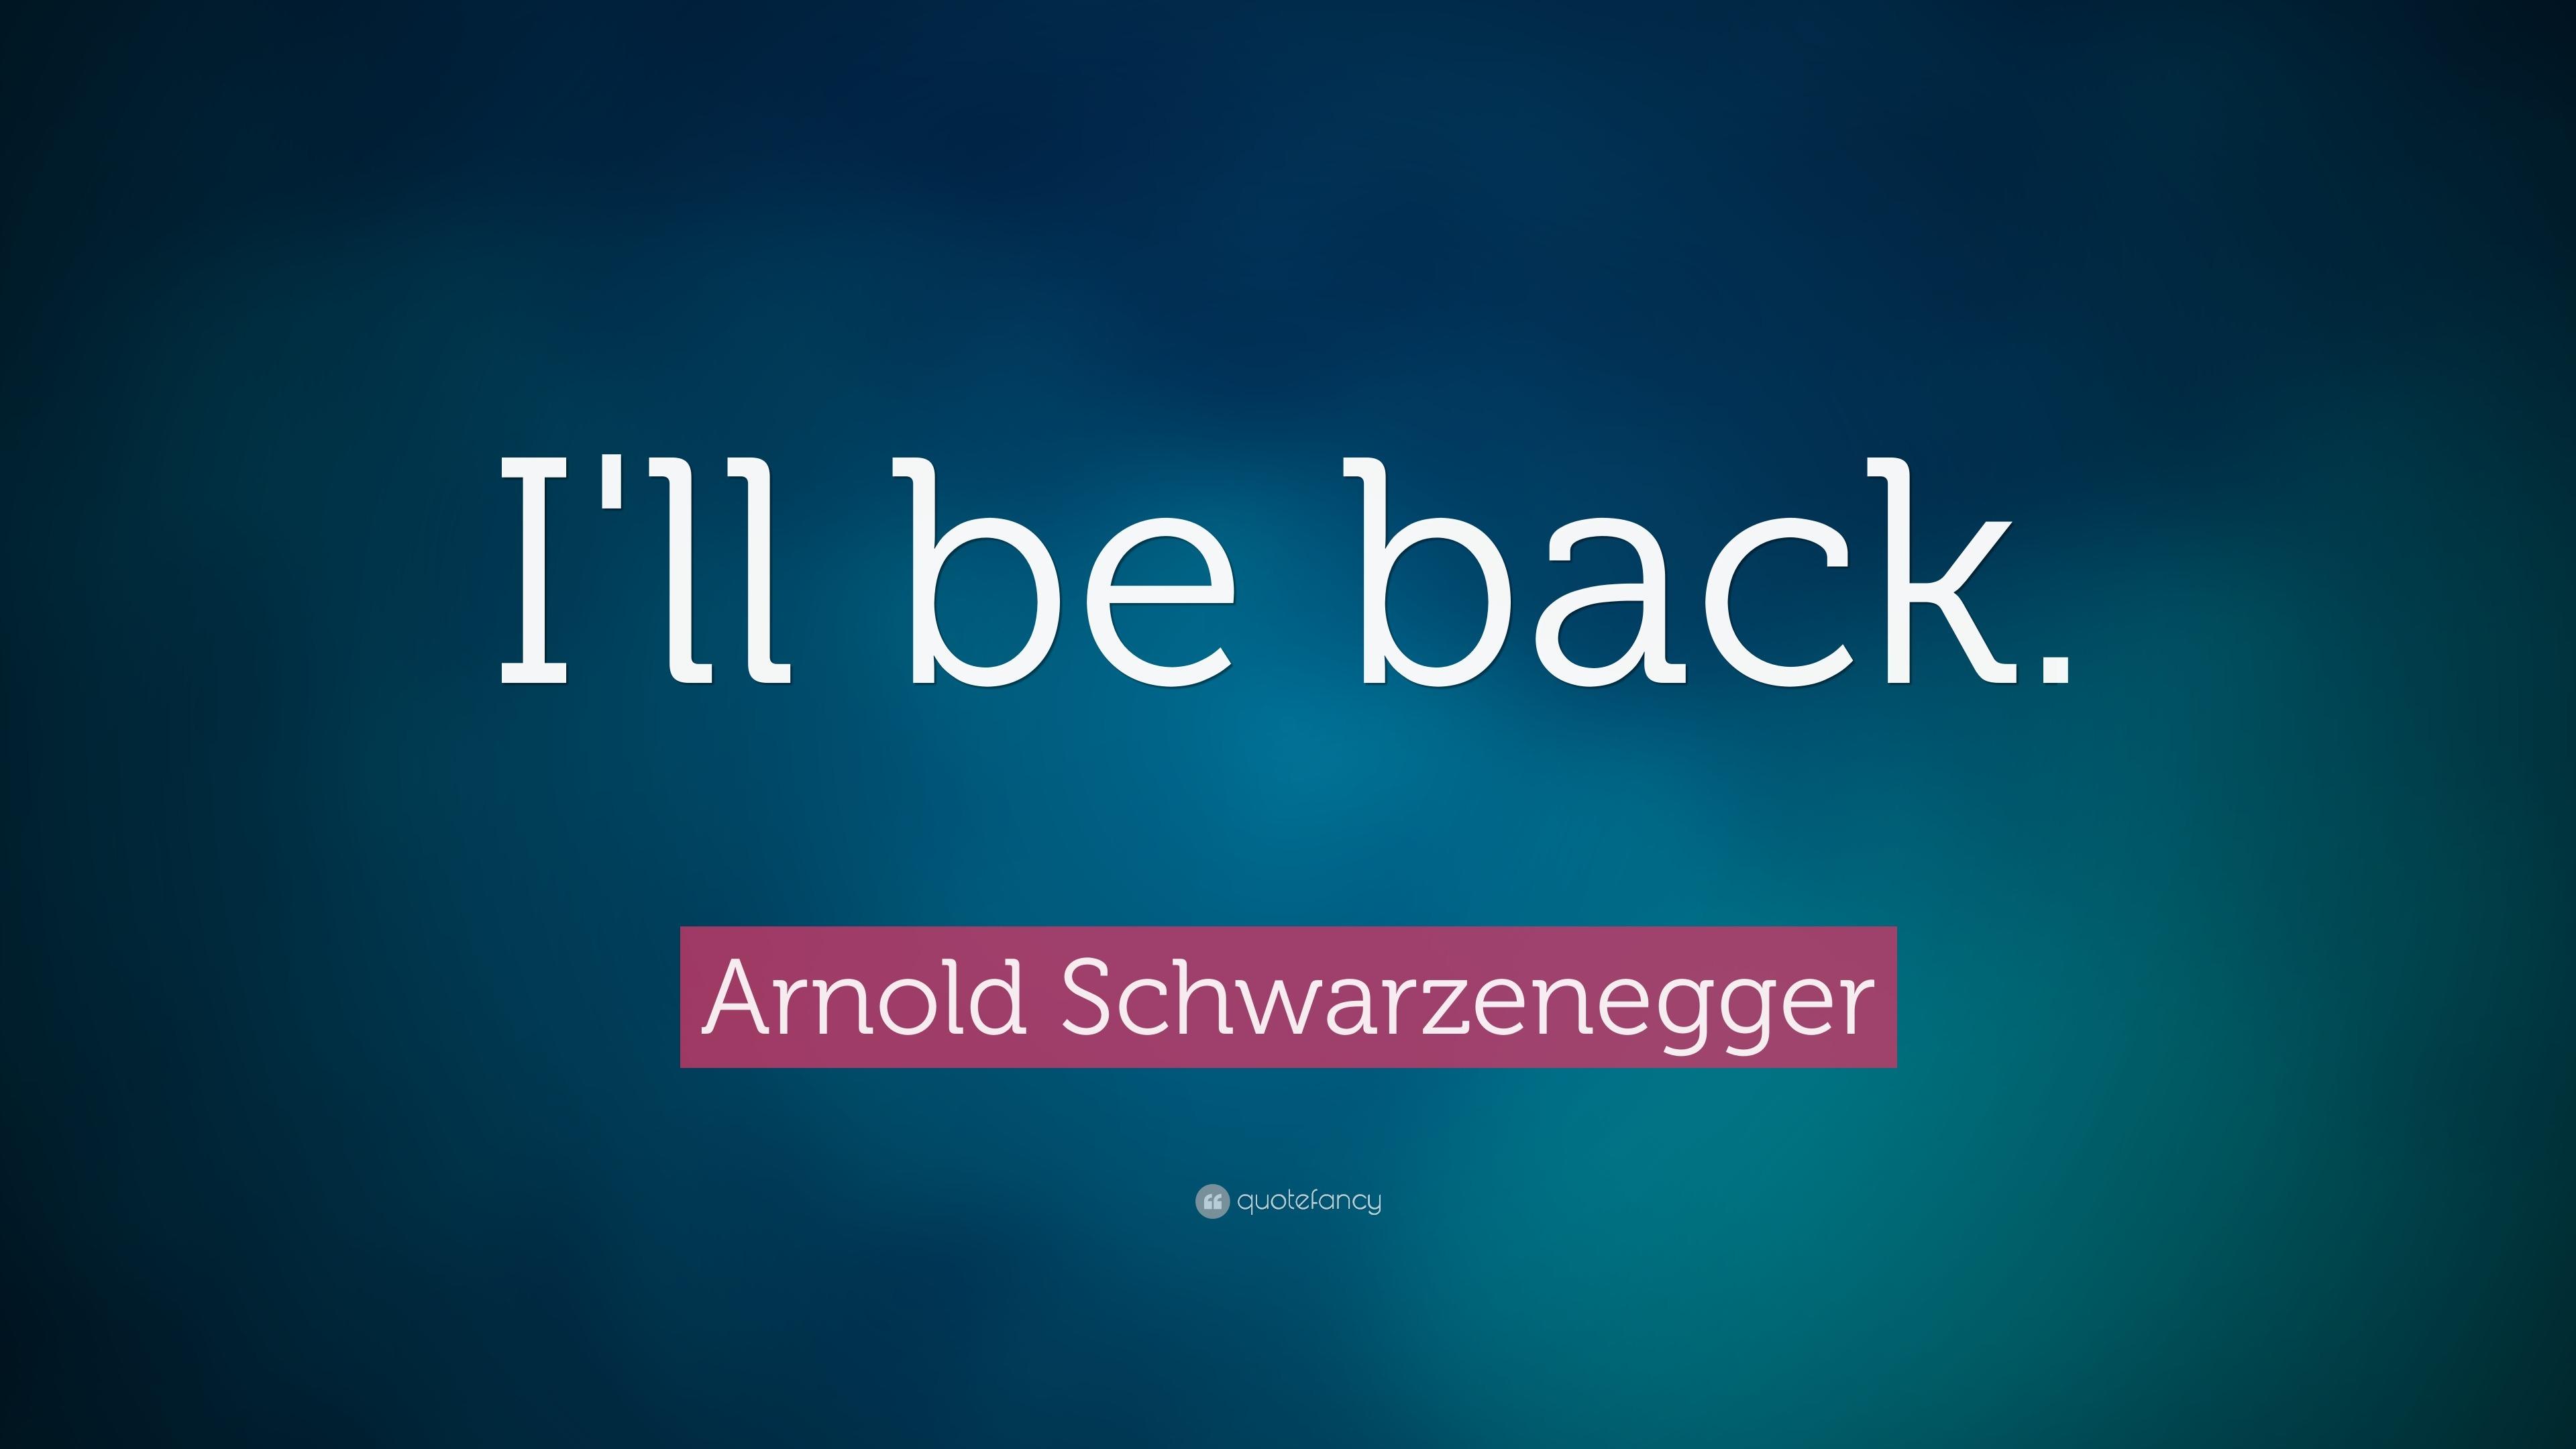 Arnold Schwarzenegger Quotes (19 Wallpapers)